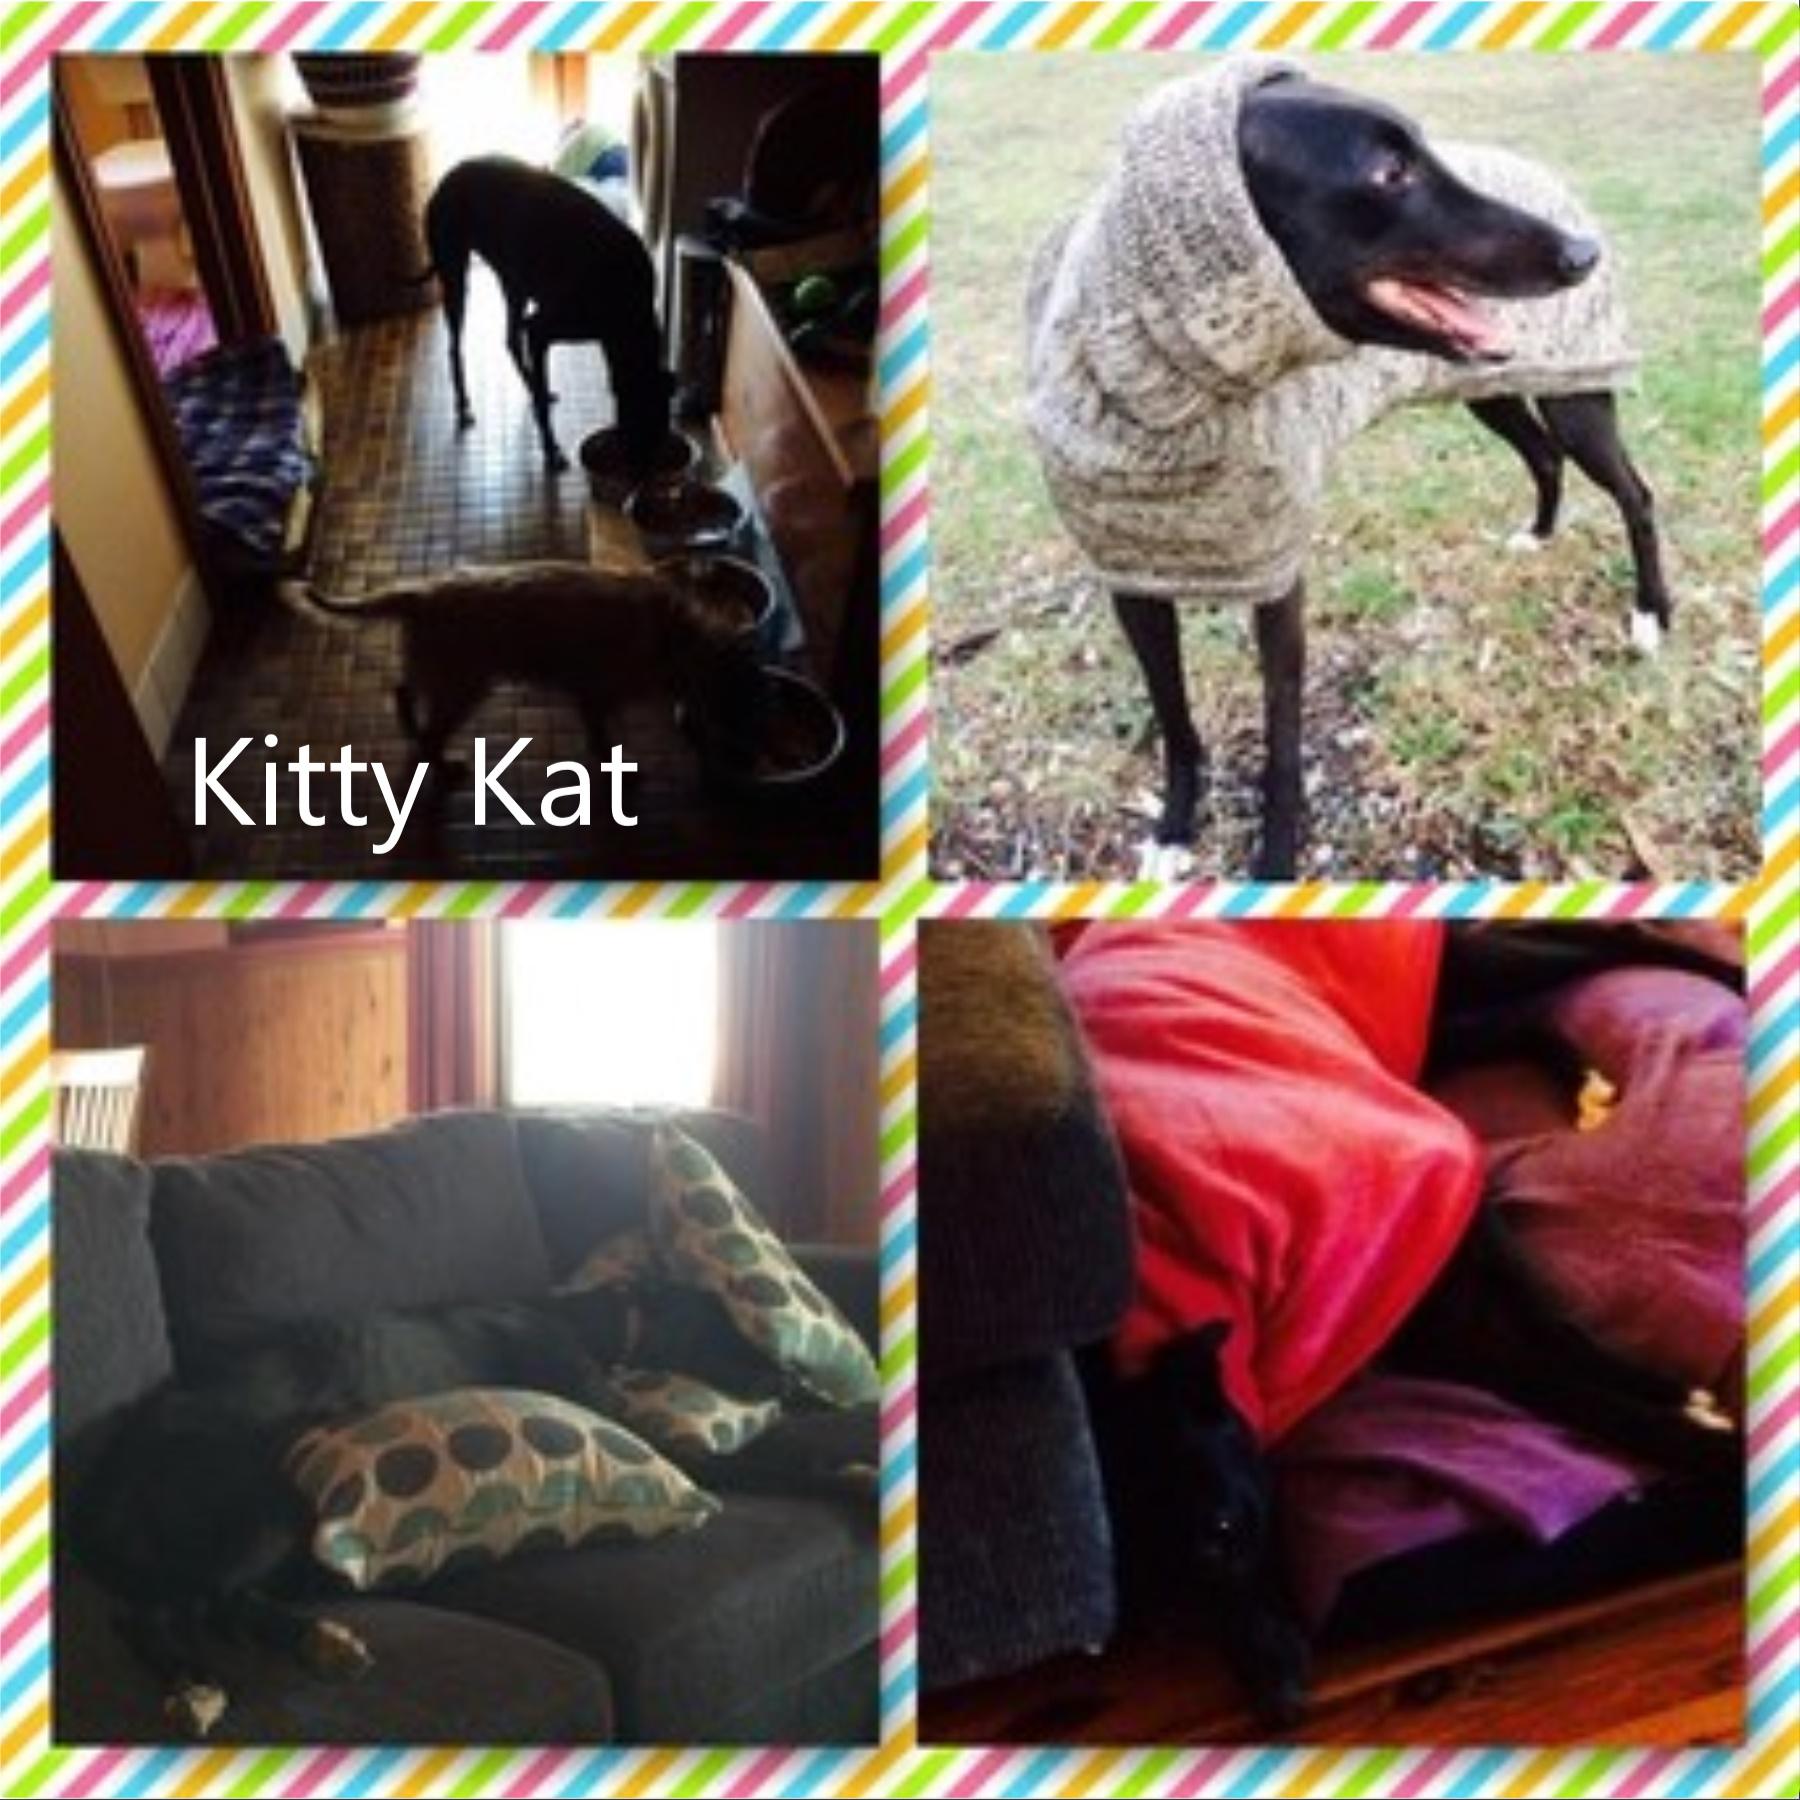 Kitty Kat (Ashley's Tip)